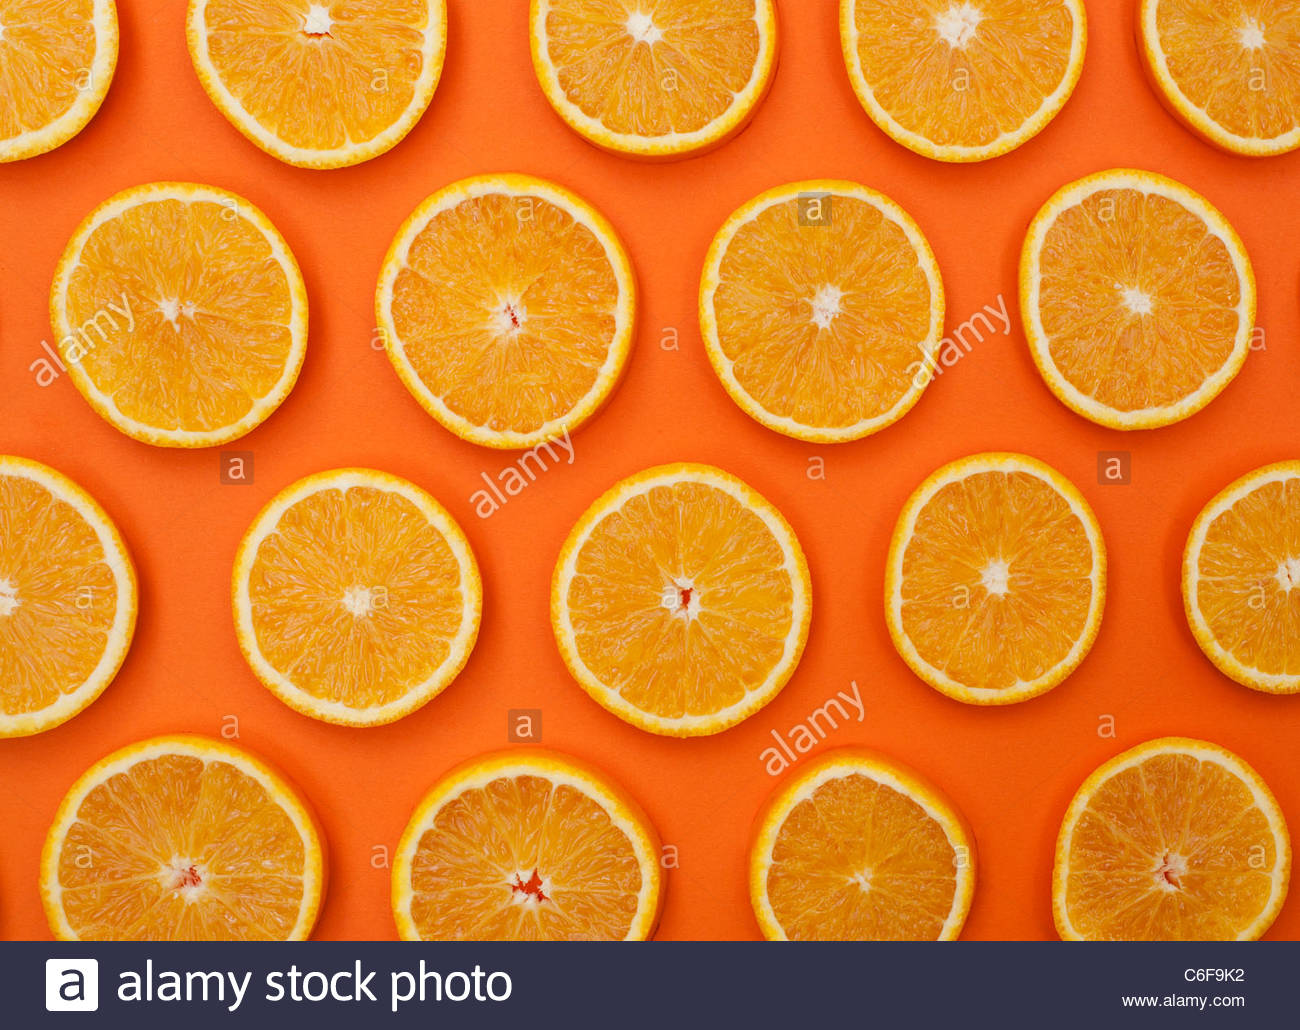 Citrus x sinensis. Orange fruit slices on orange background . Food pattern - Stock Image